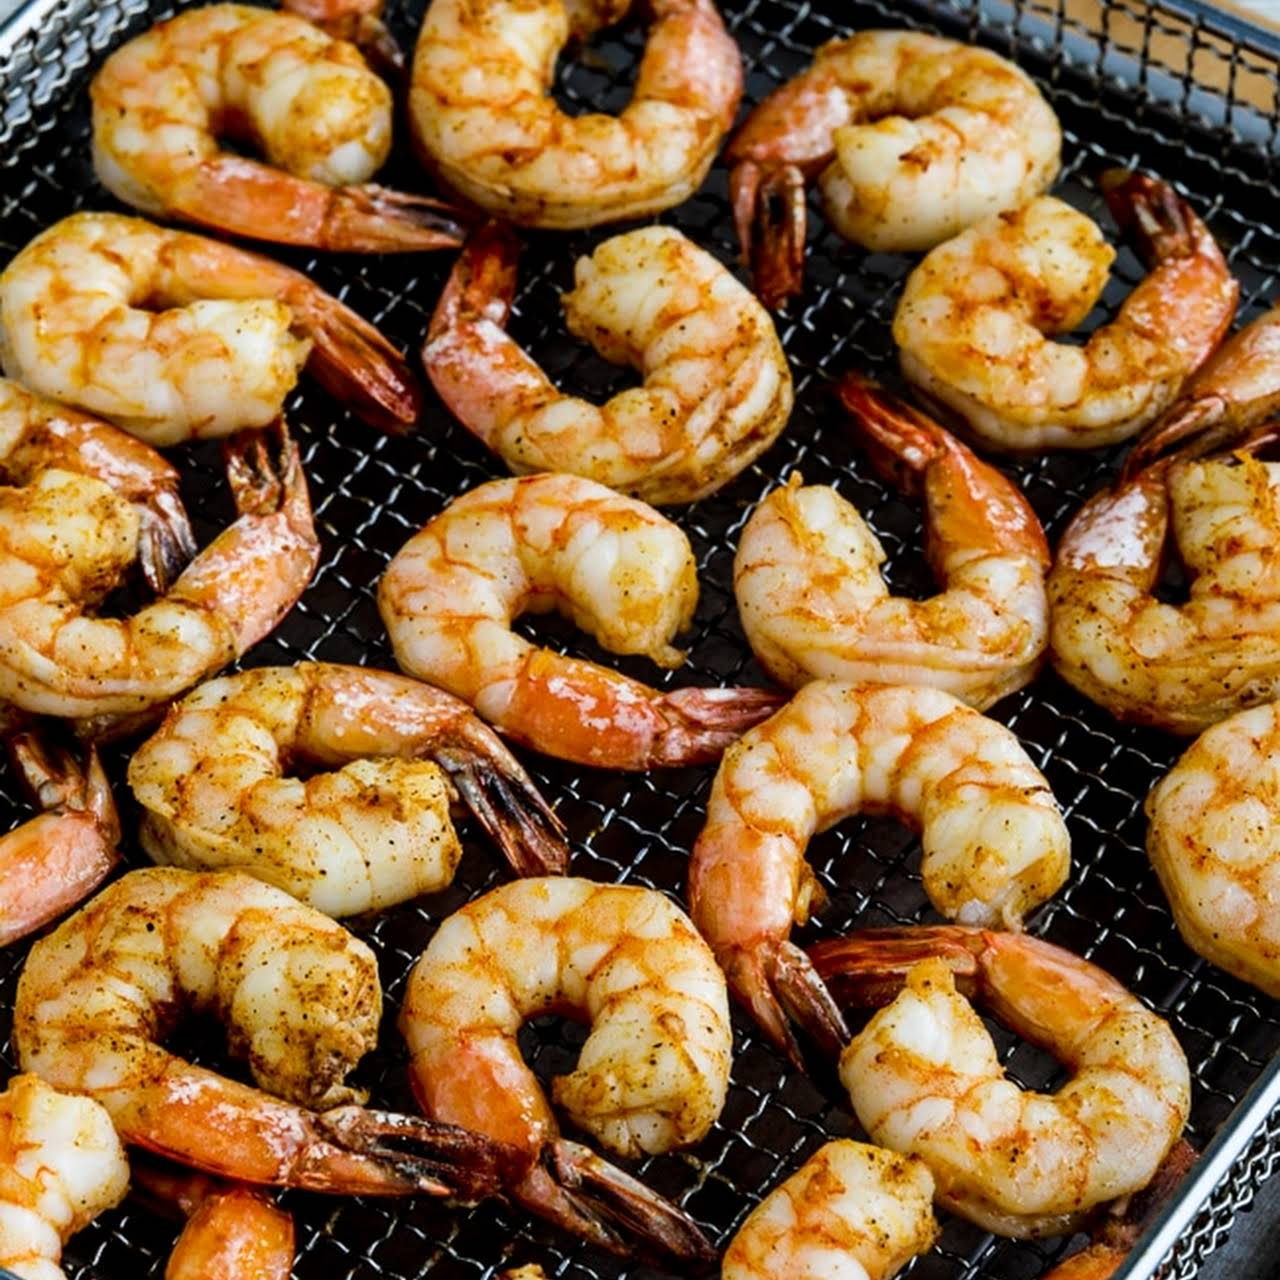 expose Fryer Shrimp